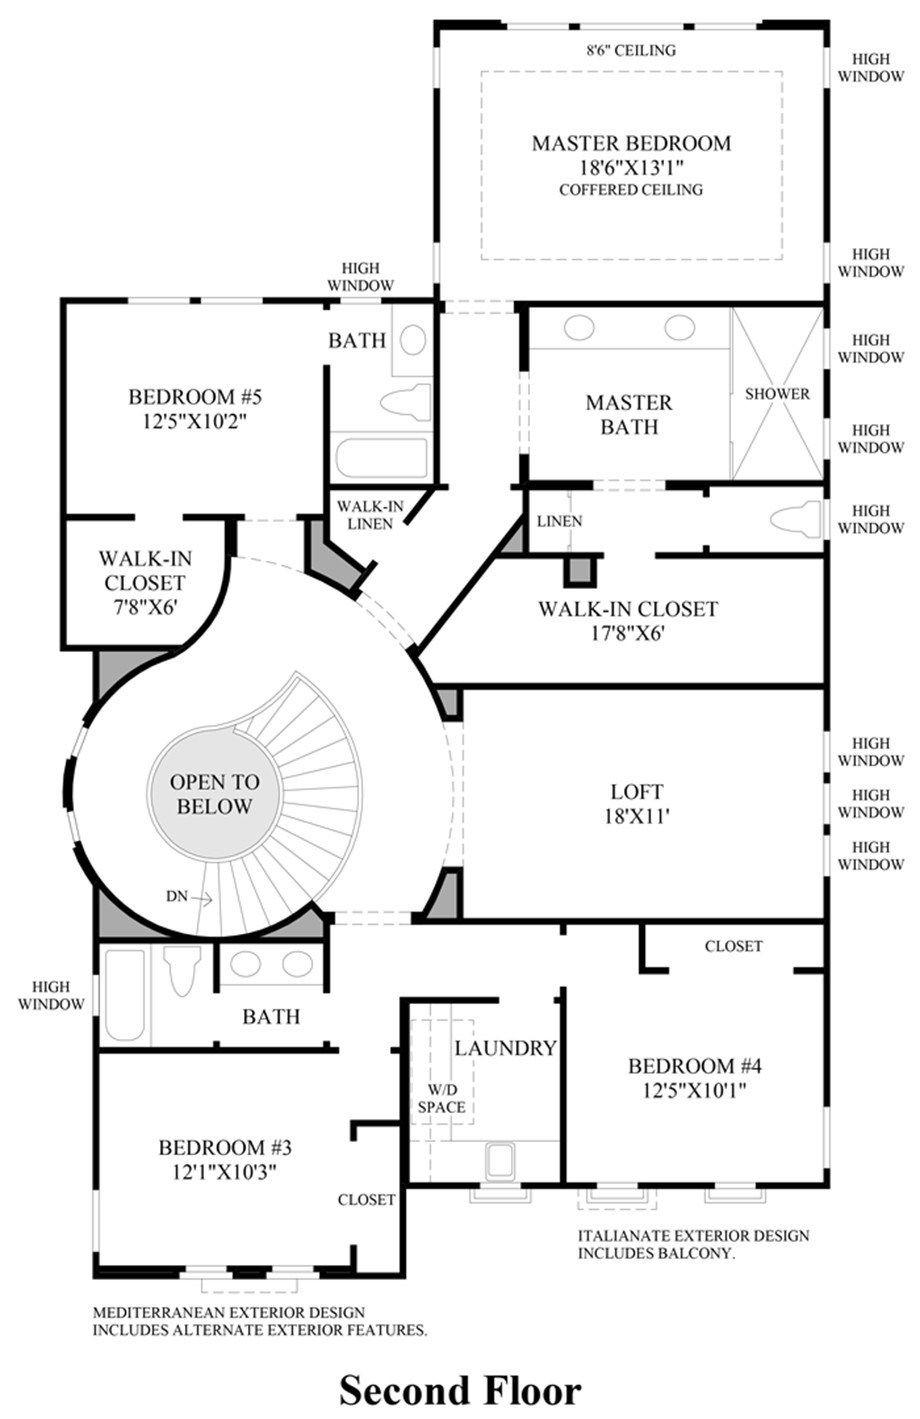 Floor Plan Symbols Bedroom Design Ideas Floor Plan Symbols